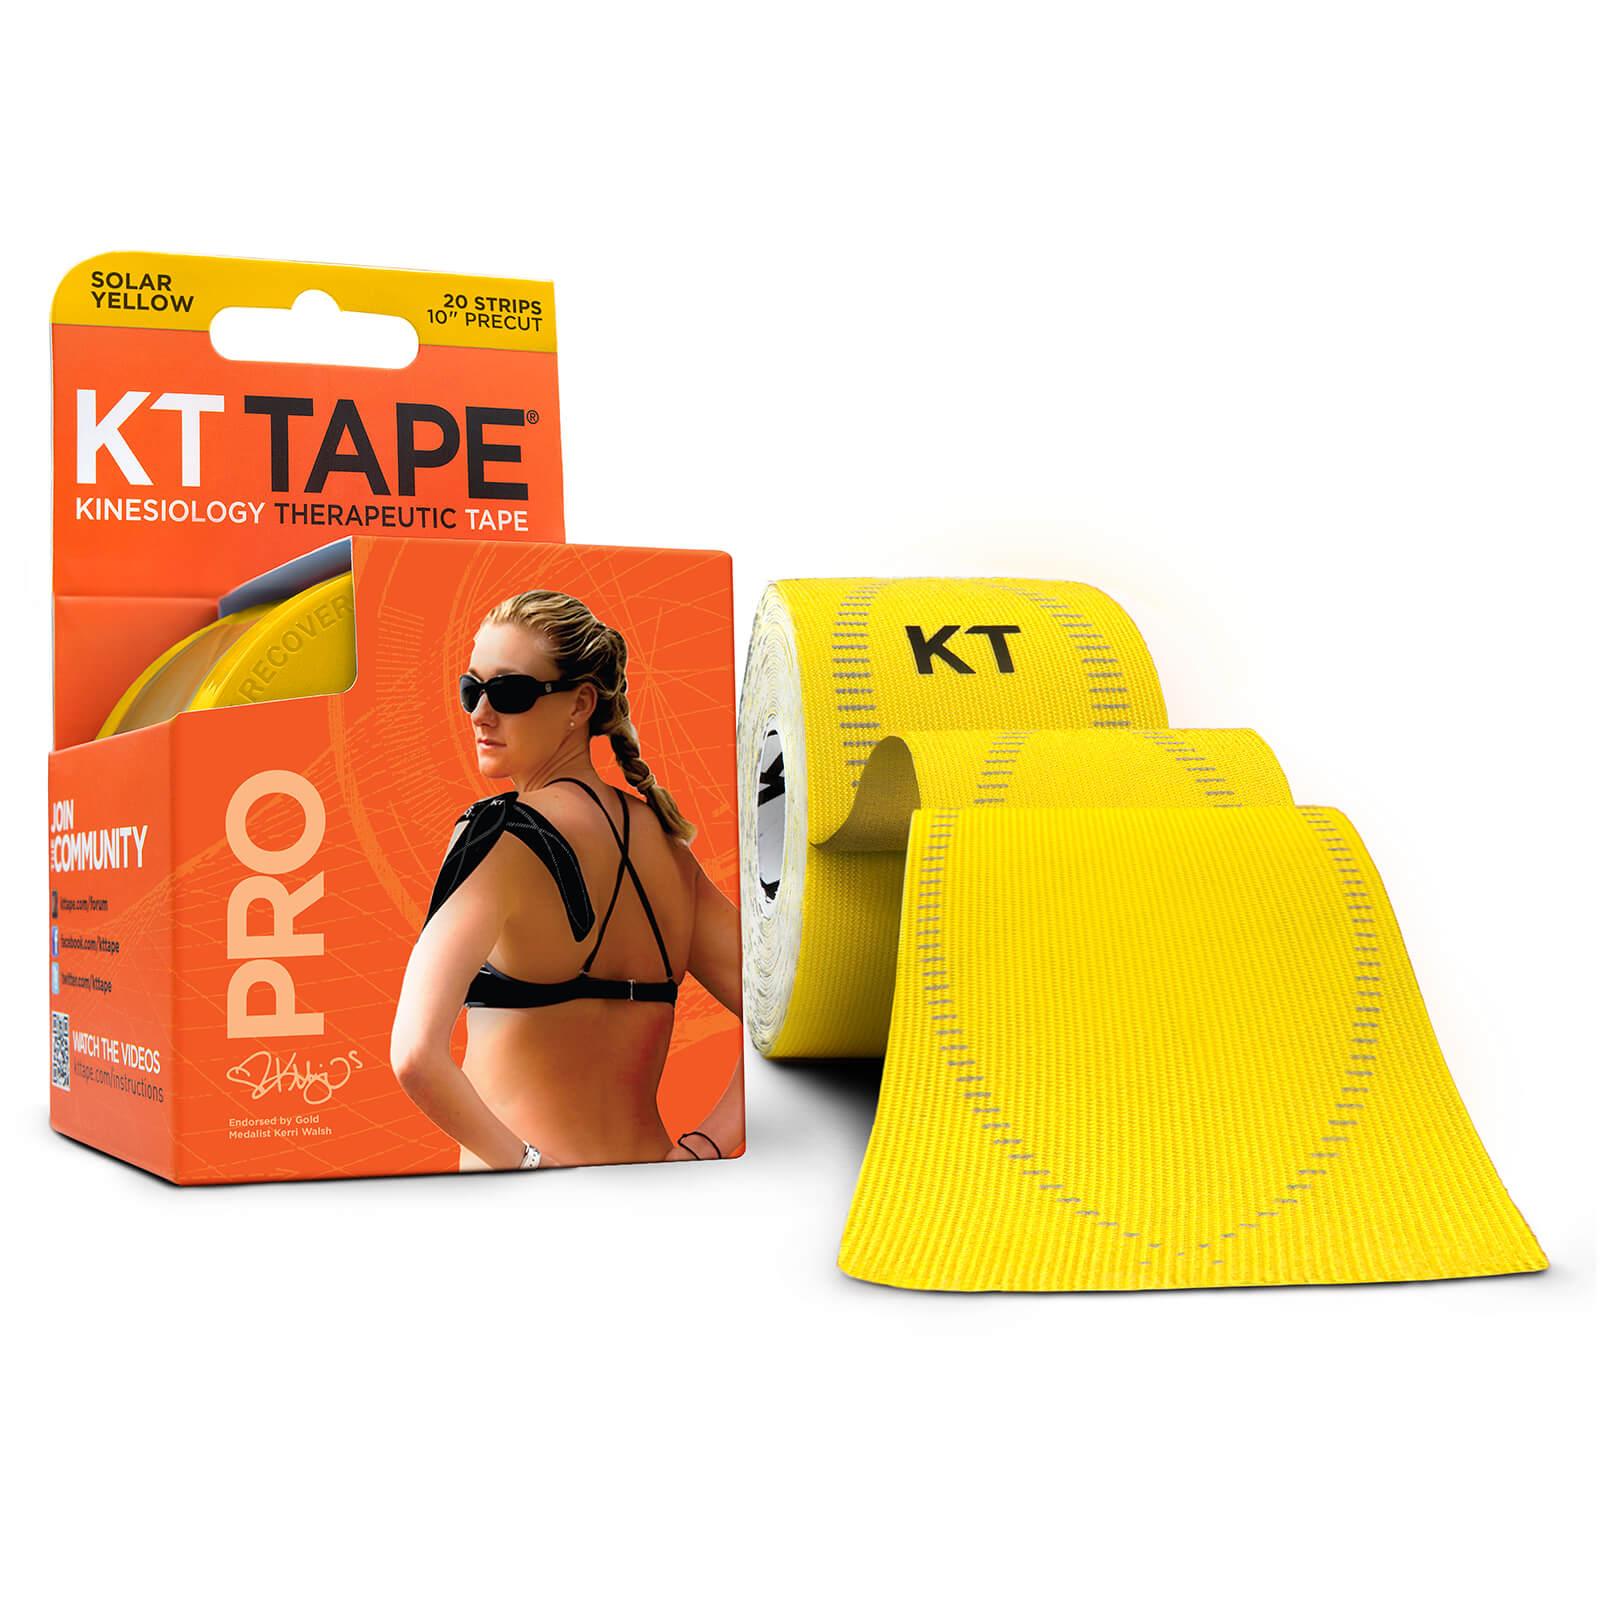 KT Tape Pro Synthetic Precut 10  - Solar Yellow